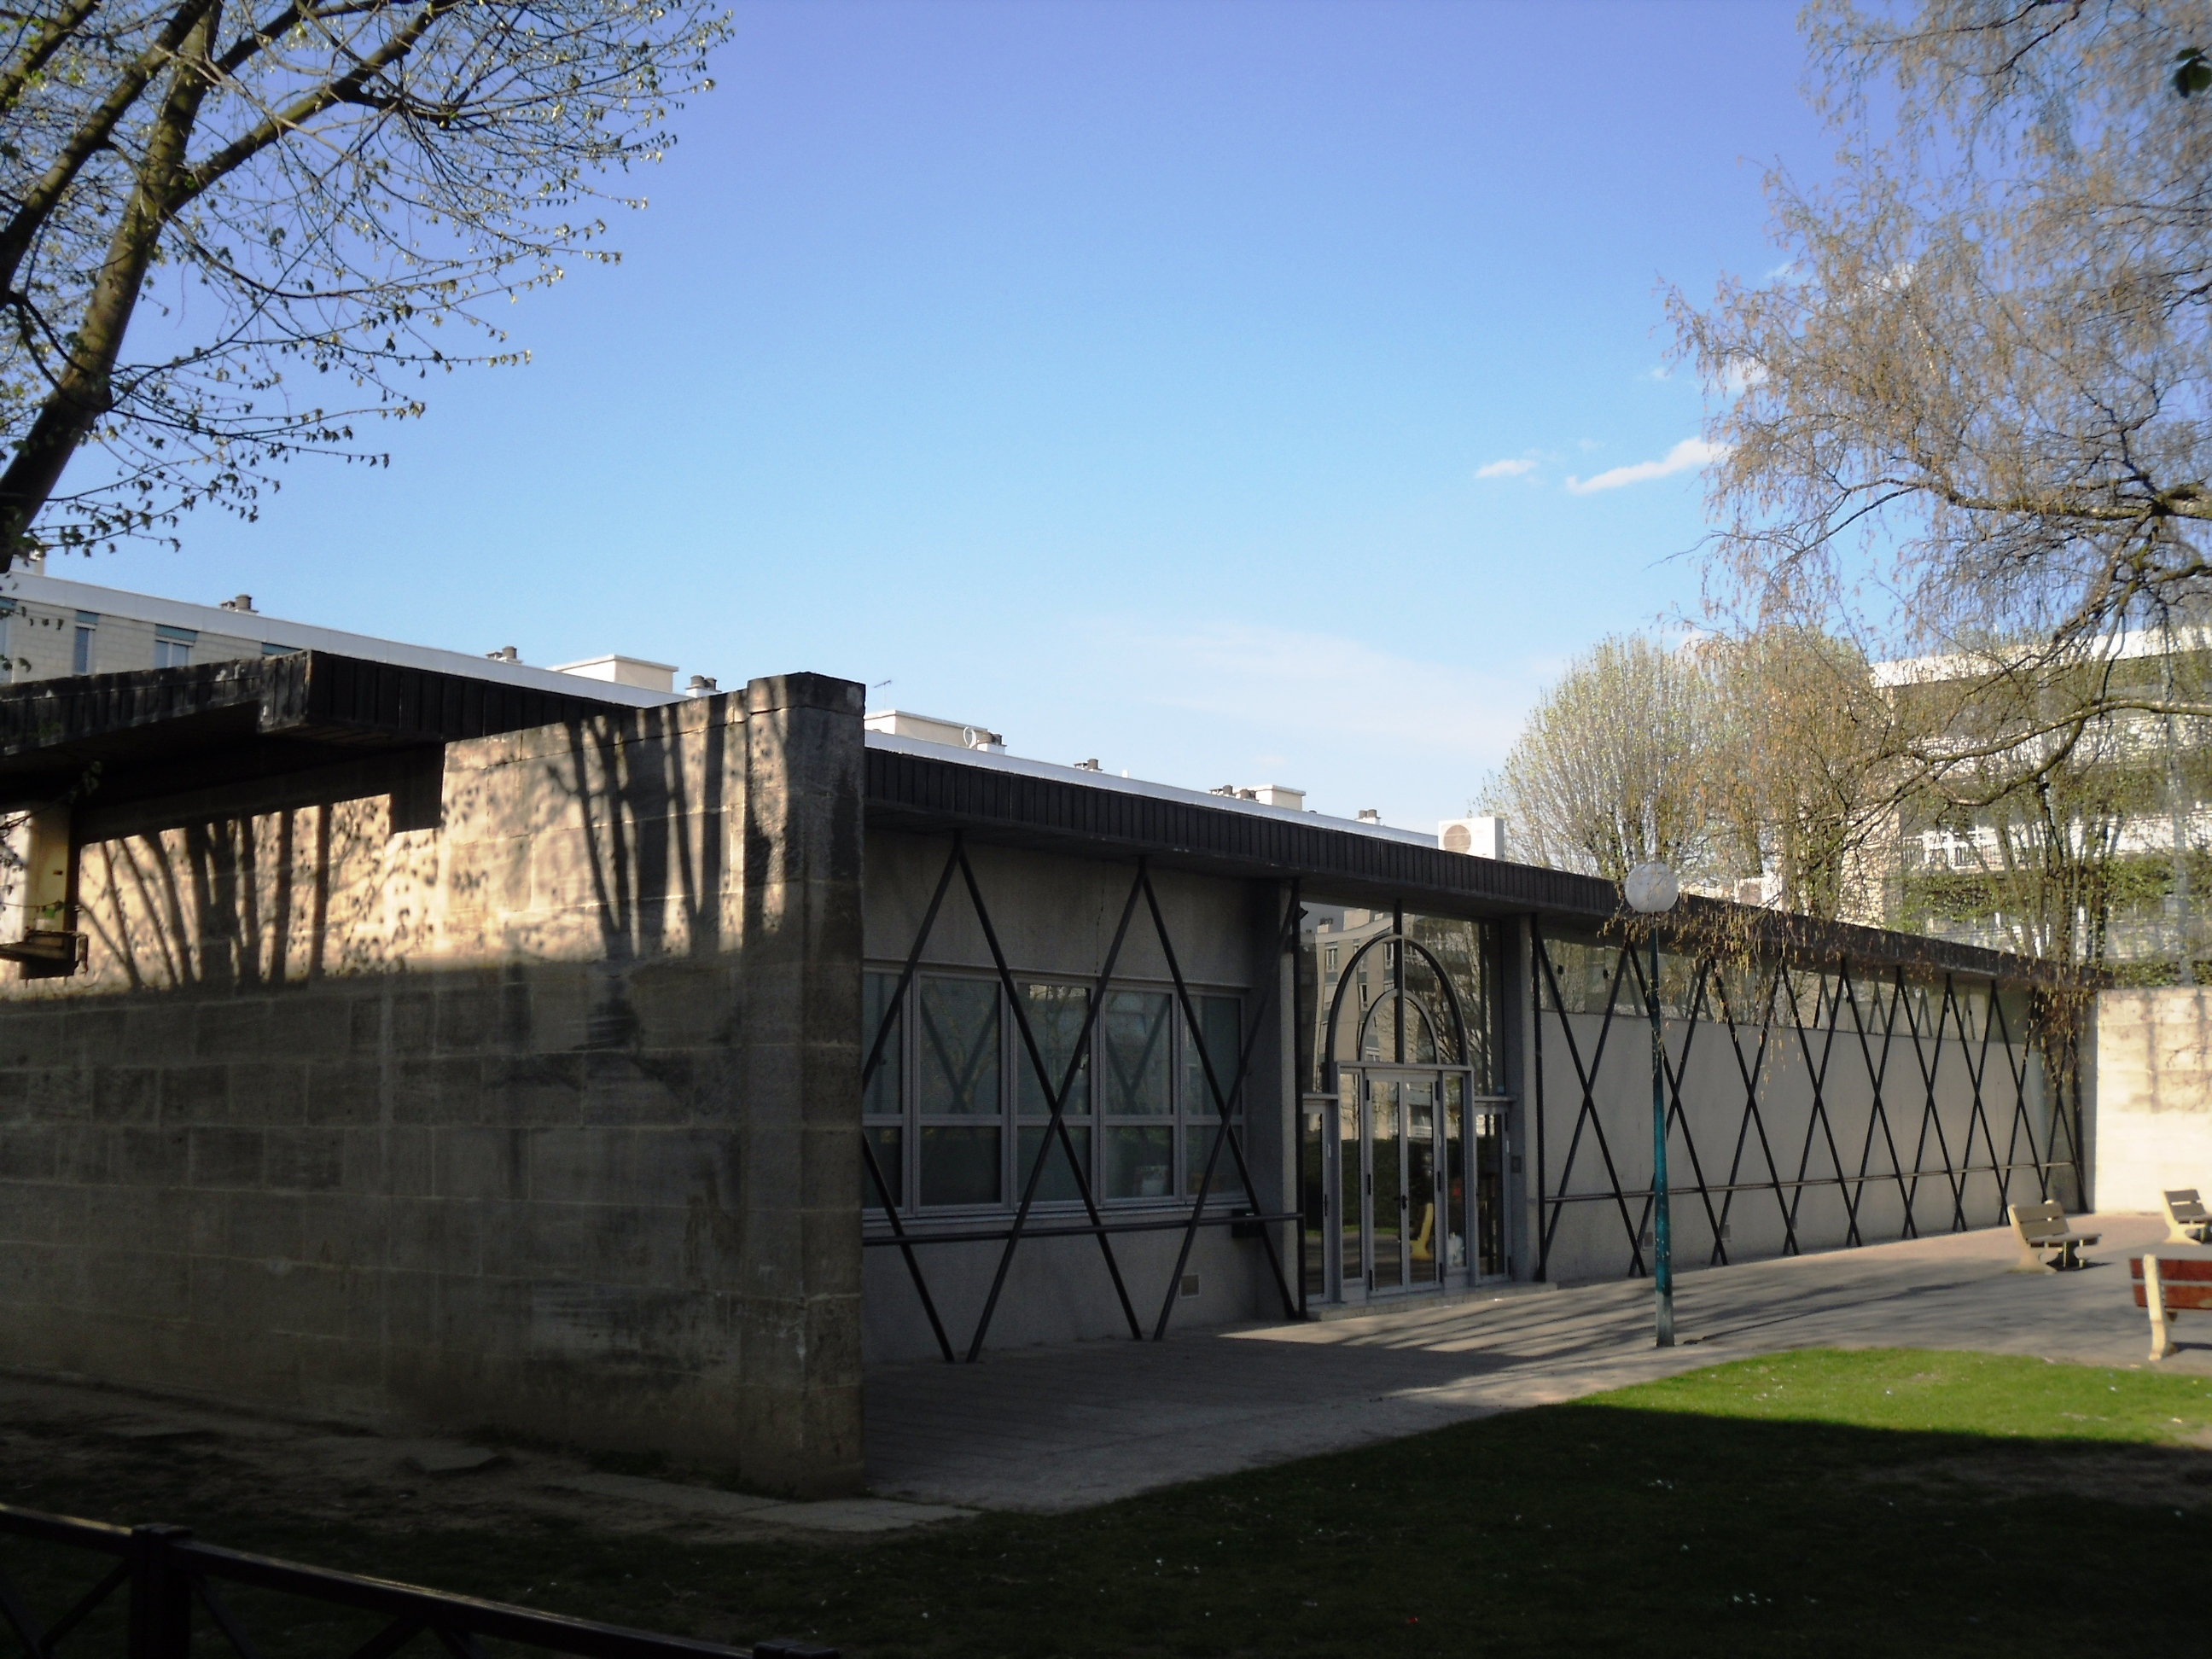 Visite de la synagogue de Massy